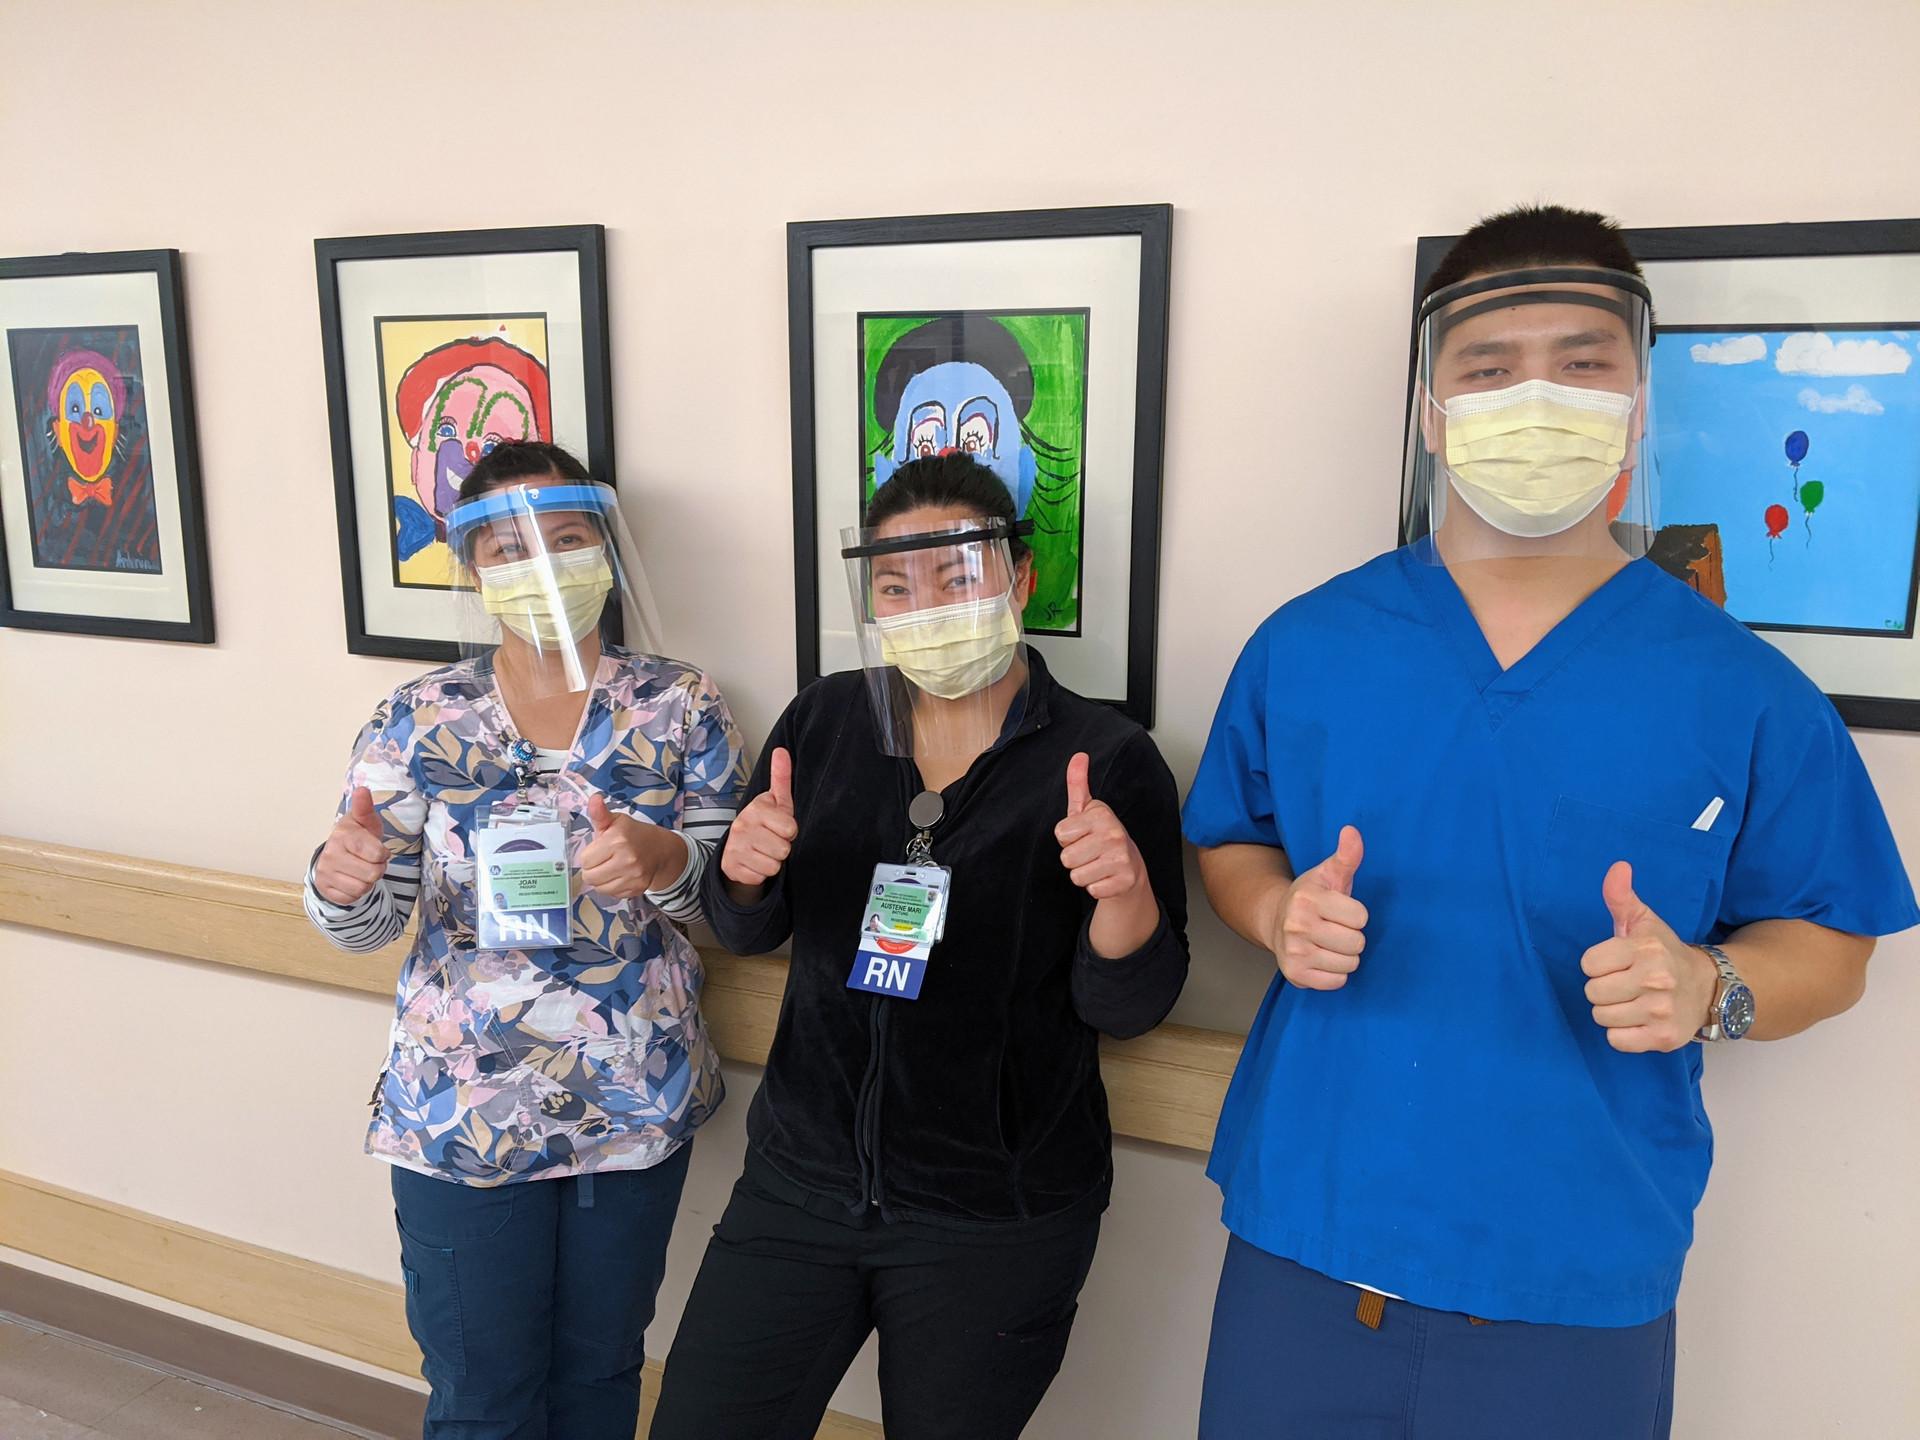 Rancho nurses wearing our shields